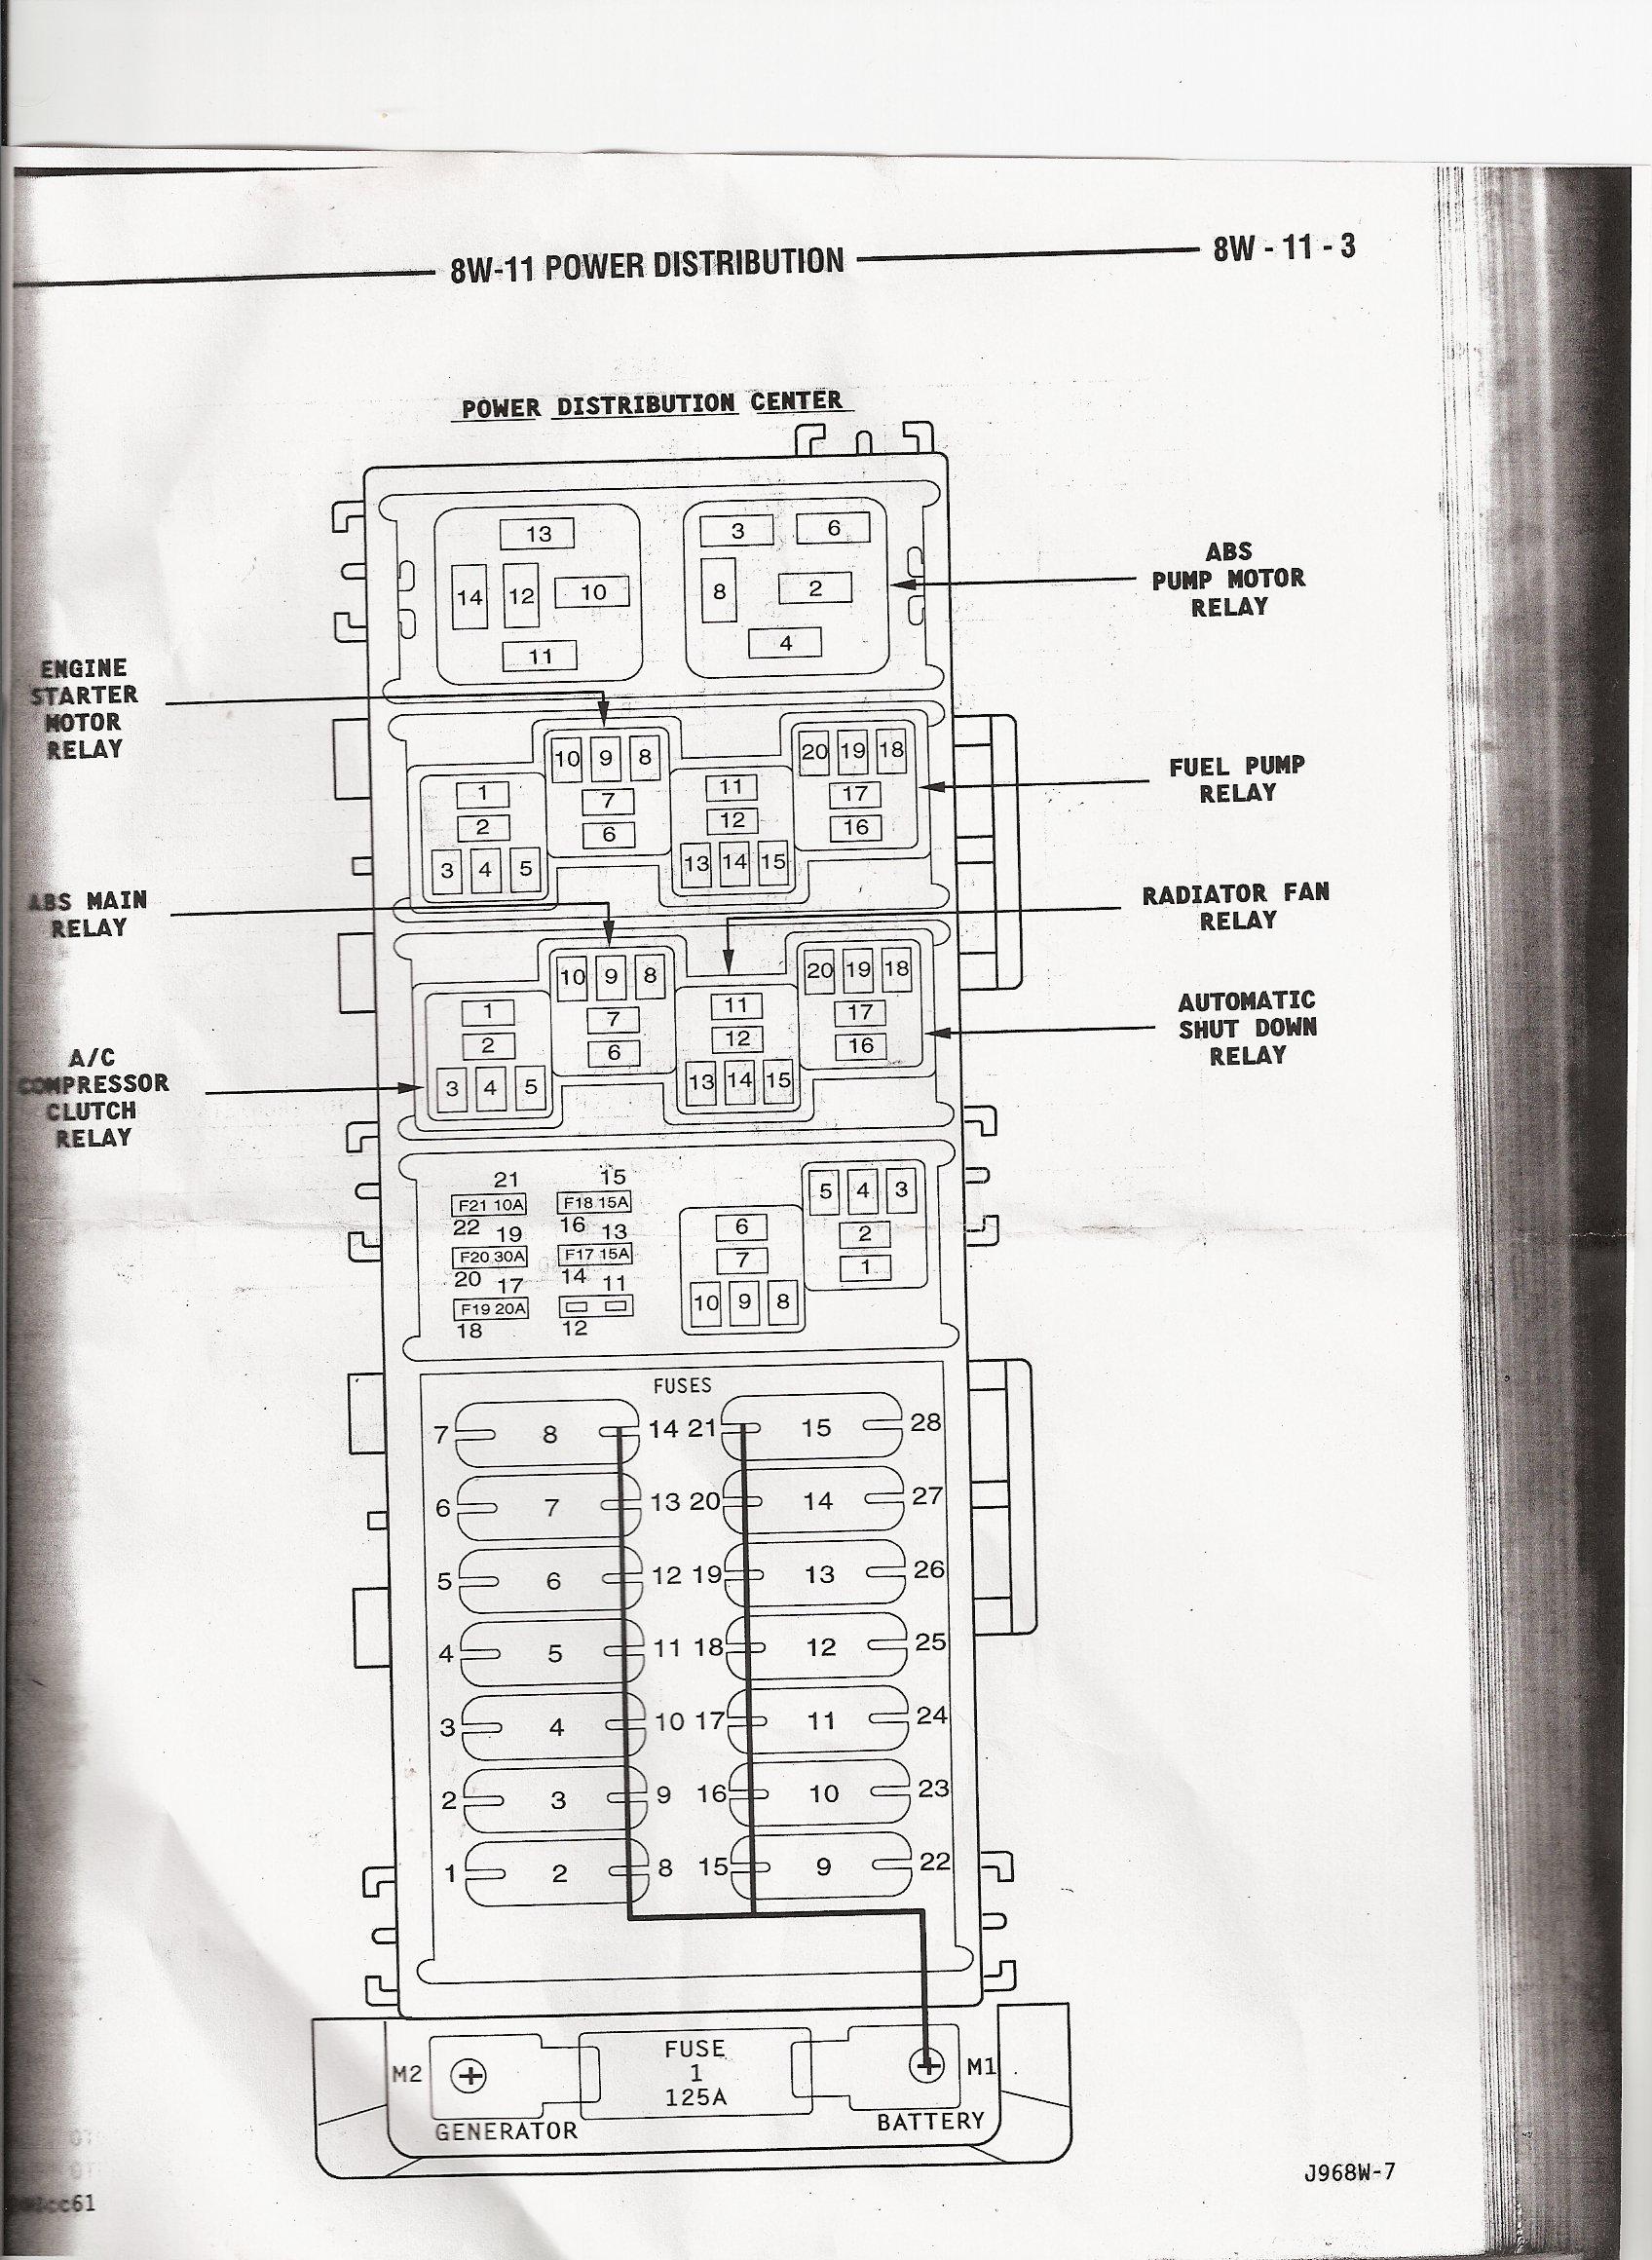 96 Jeep Grand Cherokee Fuse Box Location Wiring Diagram System Pose Image A Pose Image A Ediliadesign It